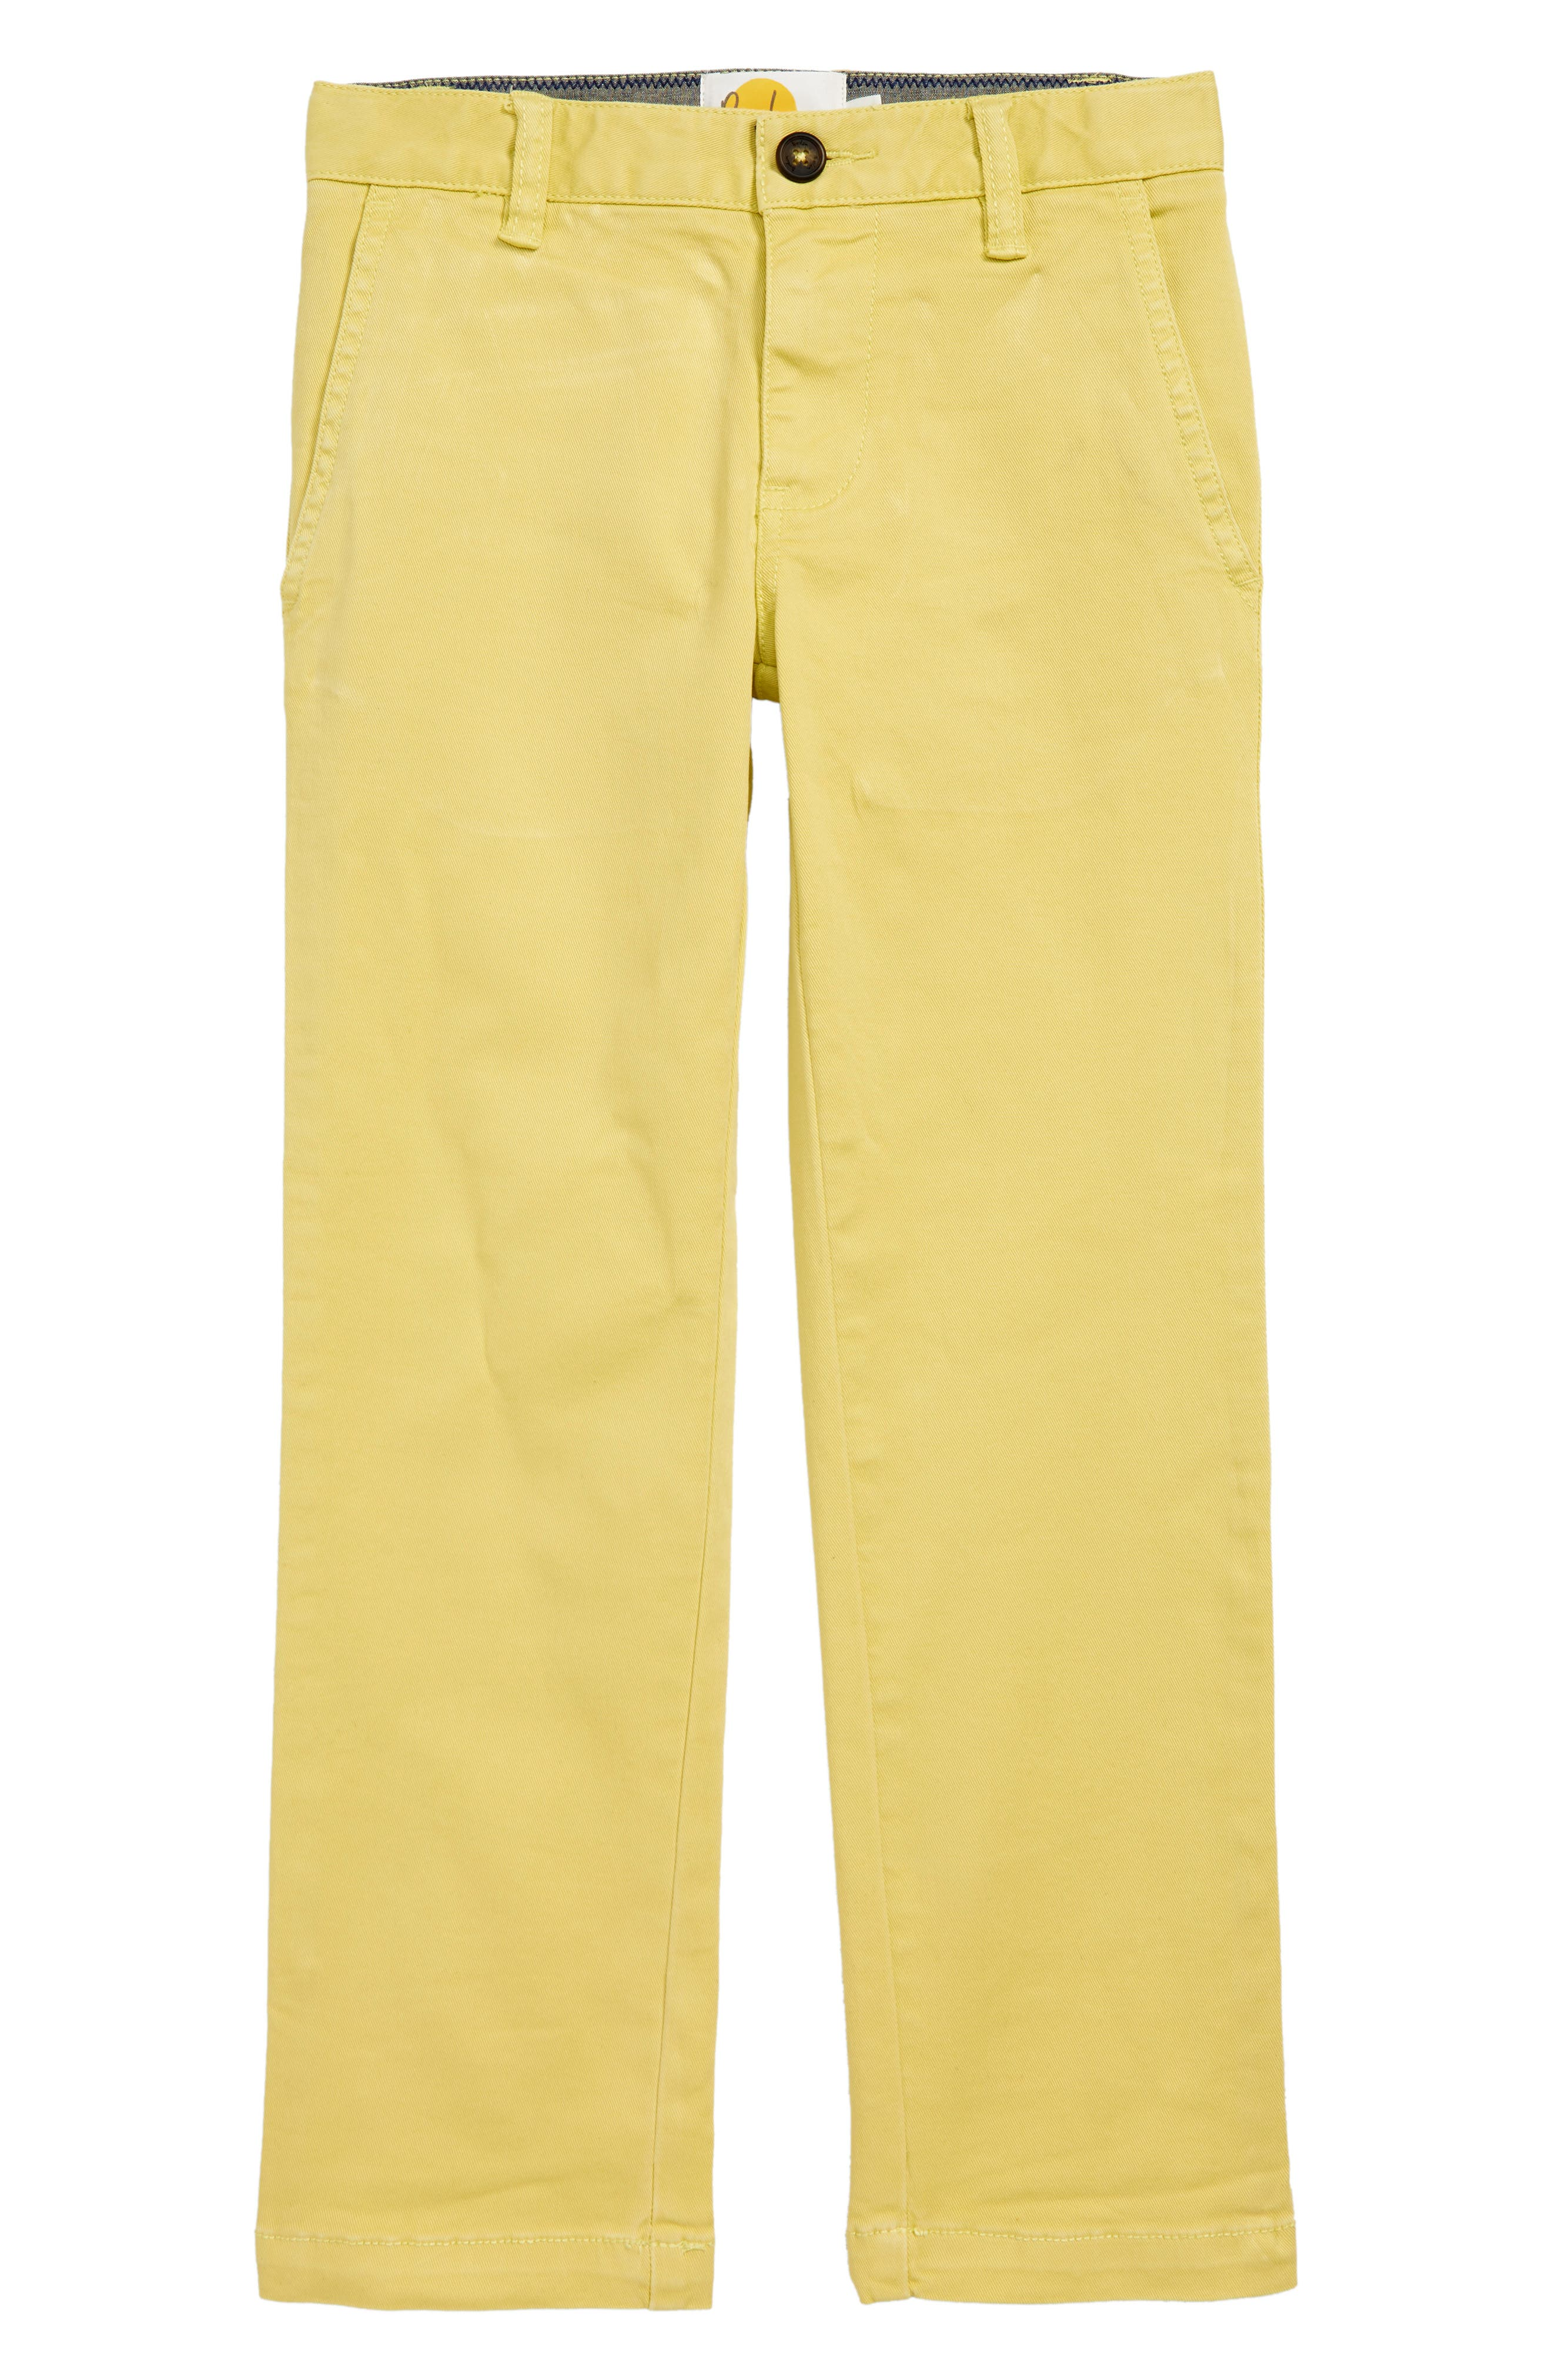 Toddler Boys Mini Boden Chino Pants Size 3Y  Yellow